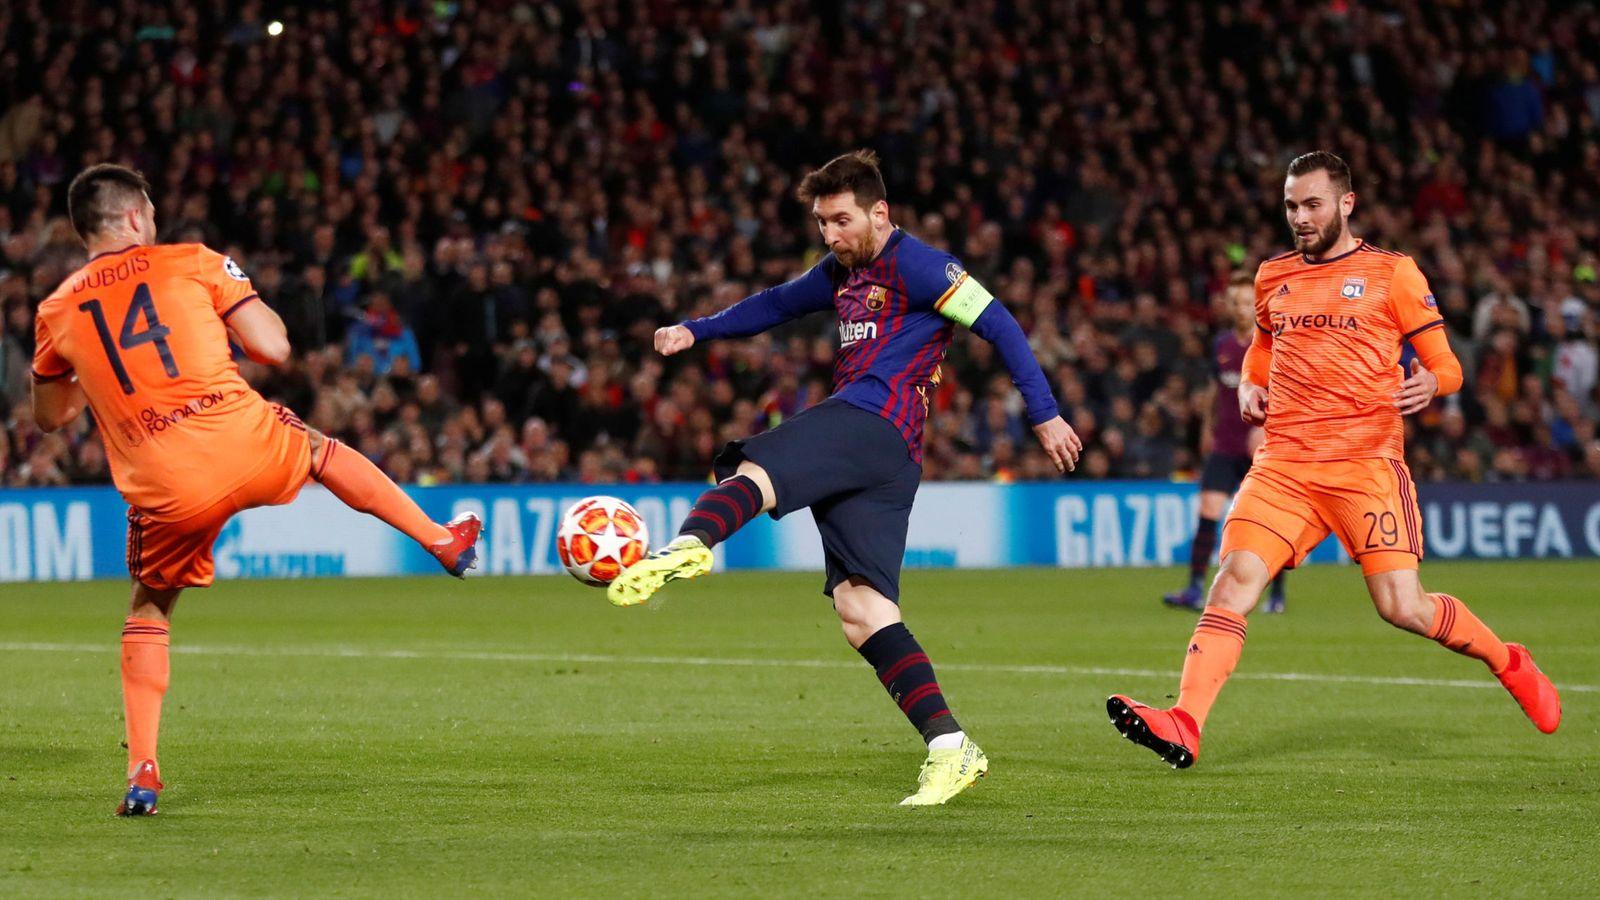 Foto: Champions league - round of 16 second leg - fc barcelona v olympique lyonnais